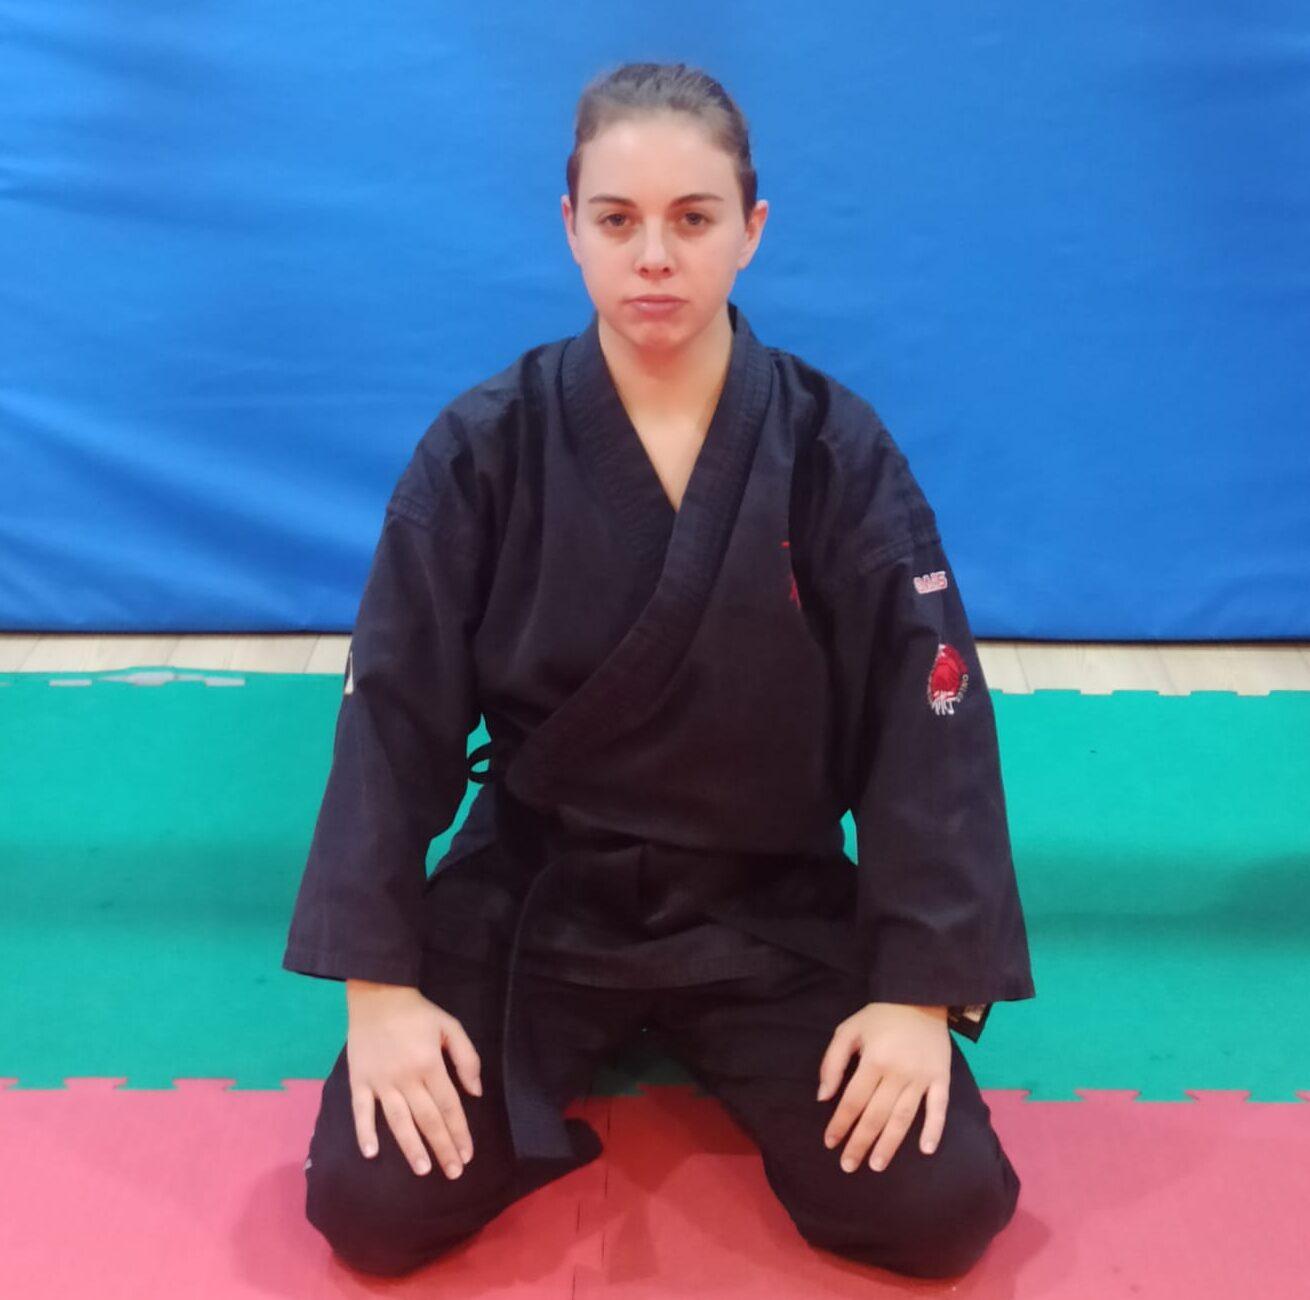 Allenatore I Dan di Ju Jitsu Elisa Mattei